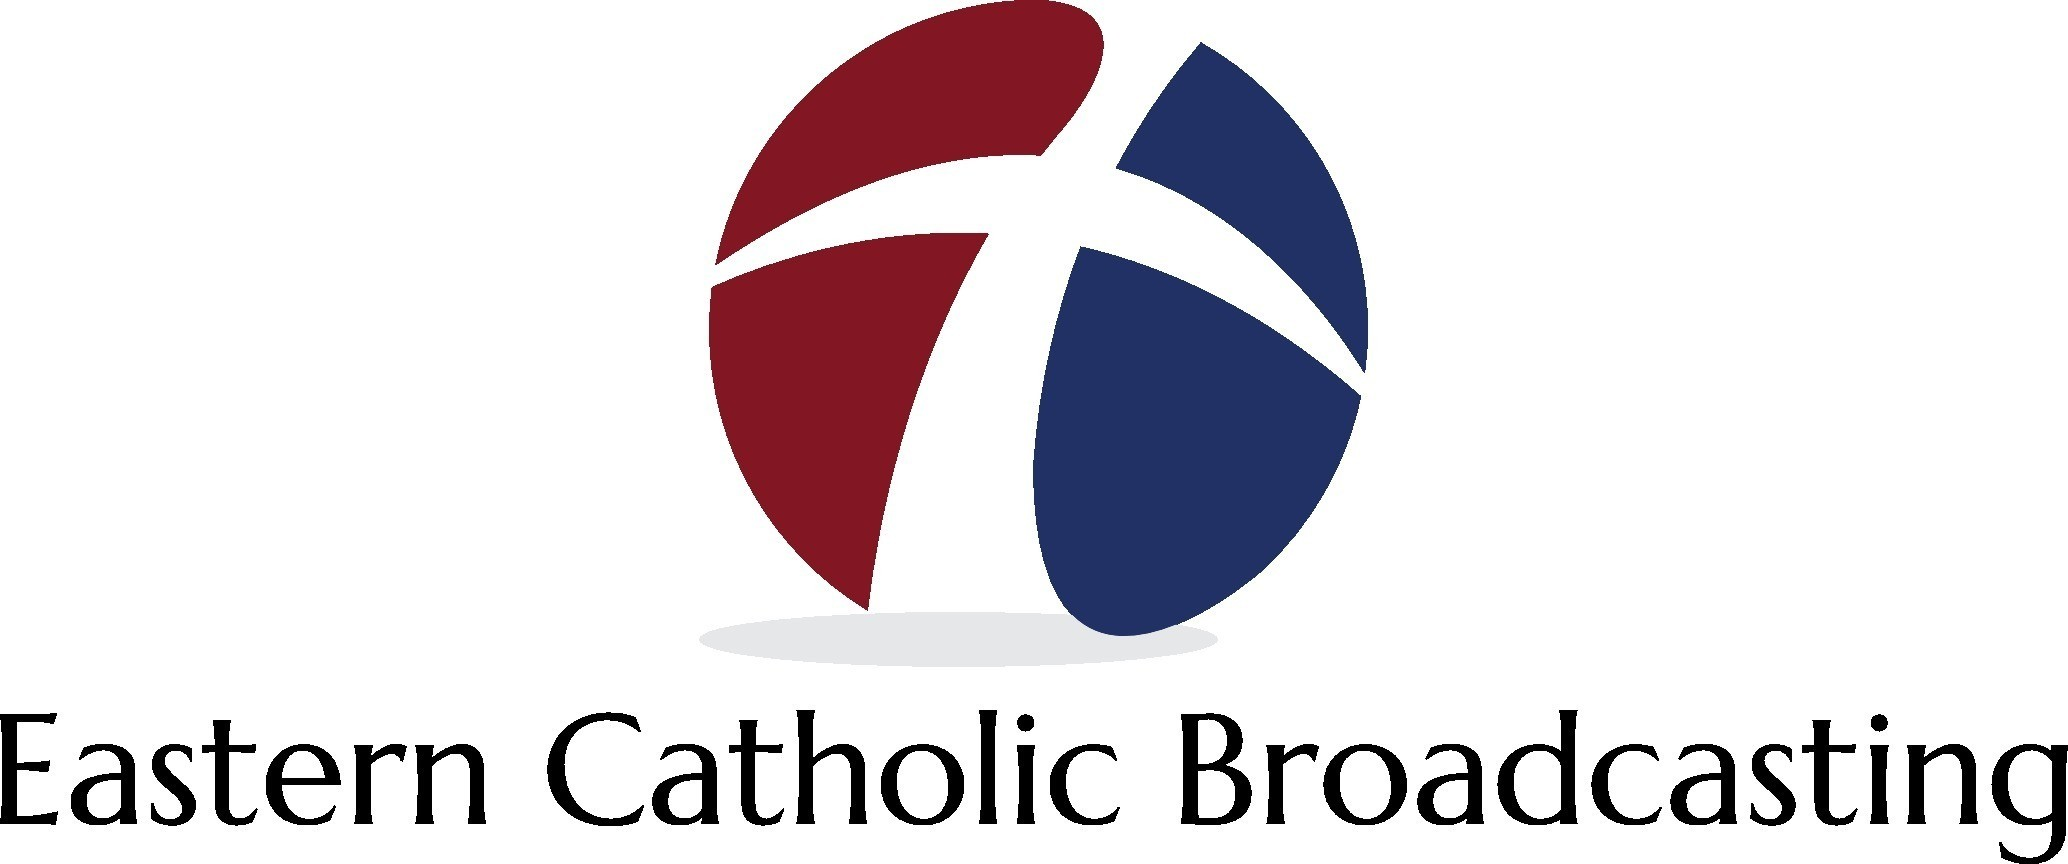 普罗菲洛 Eastern Catholic Radio 卡纳勒电视